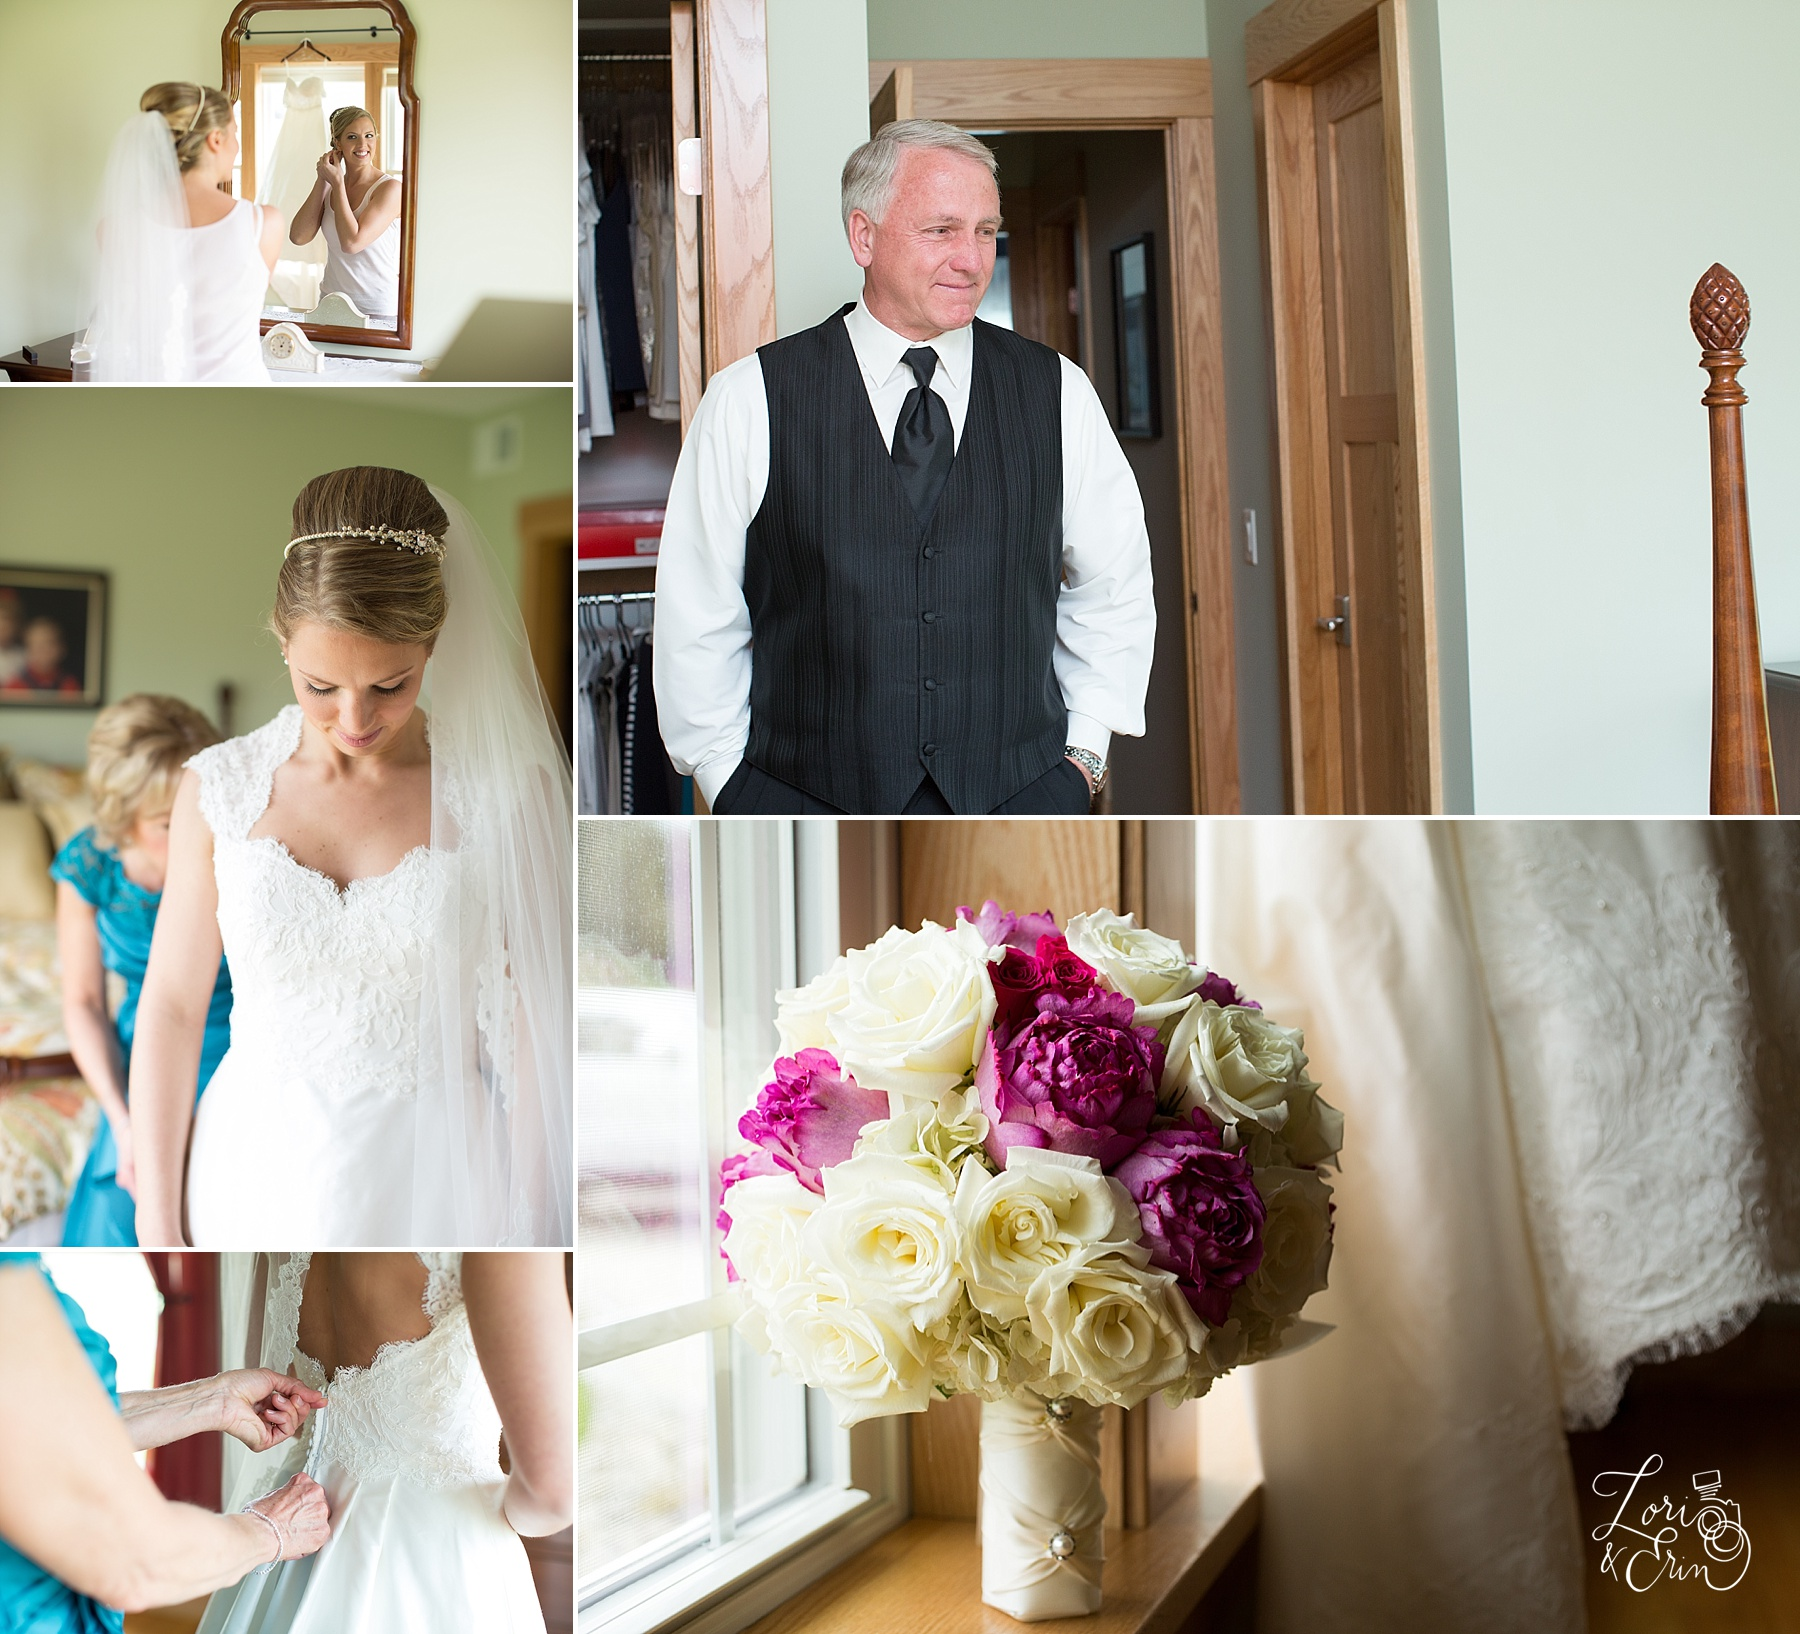 getting ready, syracuse ny wedding photography